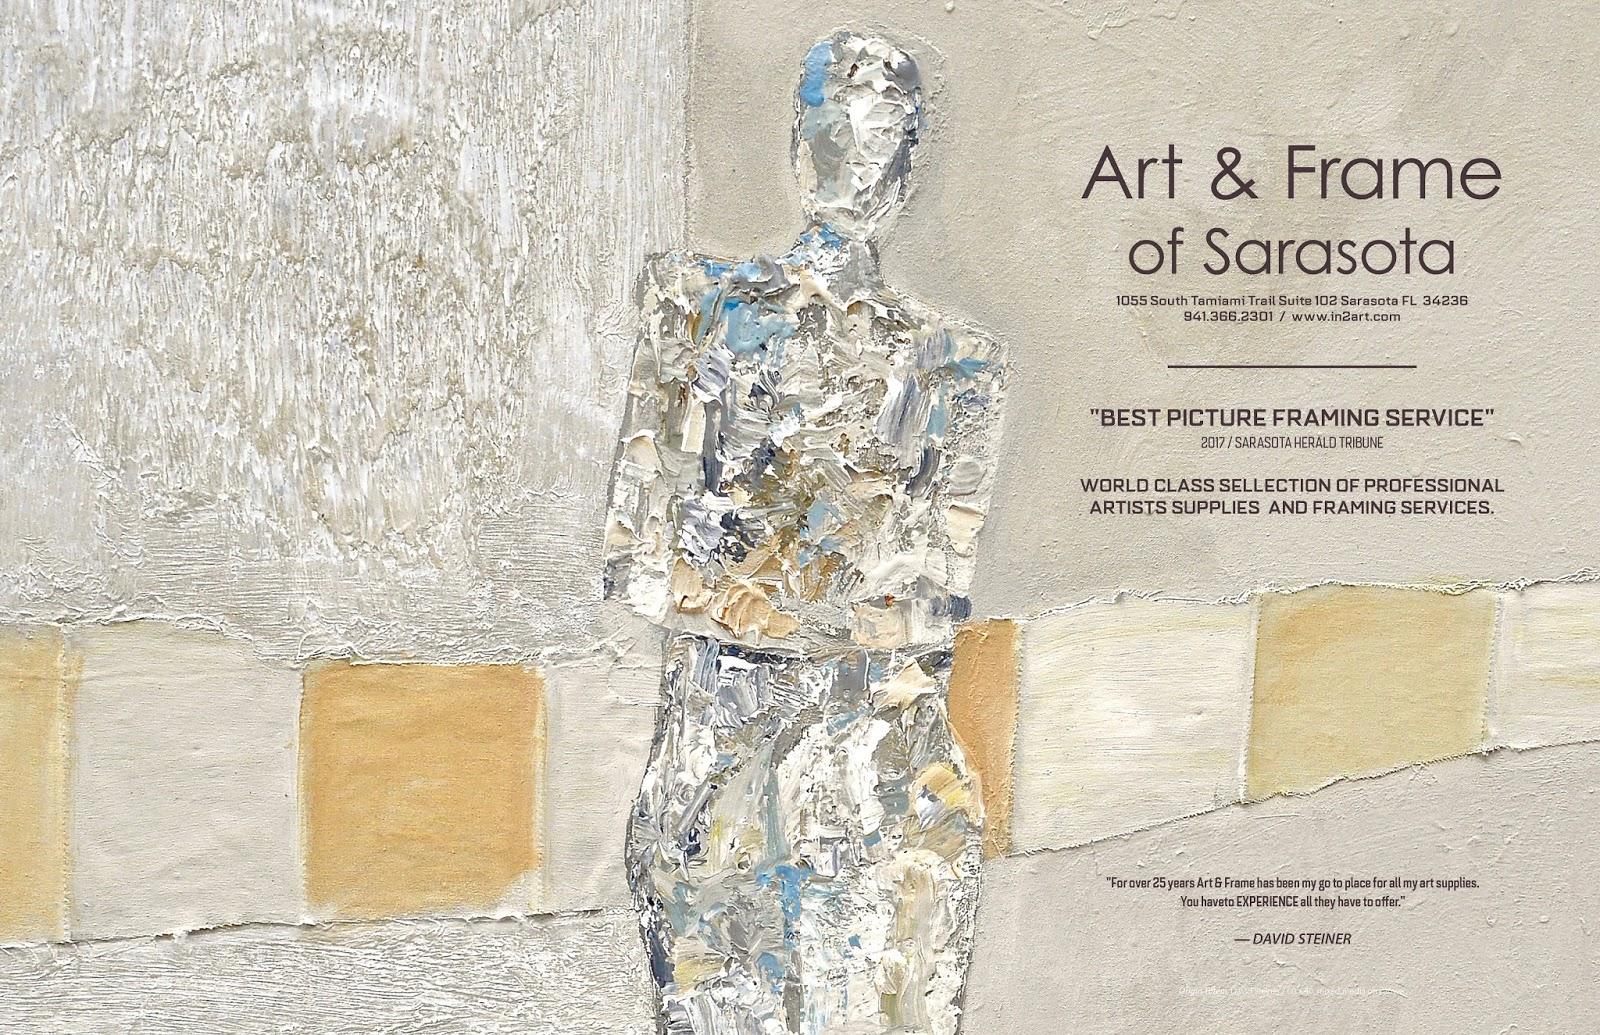 Luxury Art And Frame Sarasota Image Collection - Framed Art Ideas ...